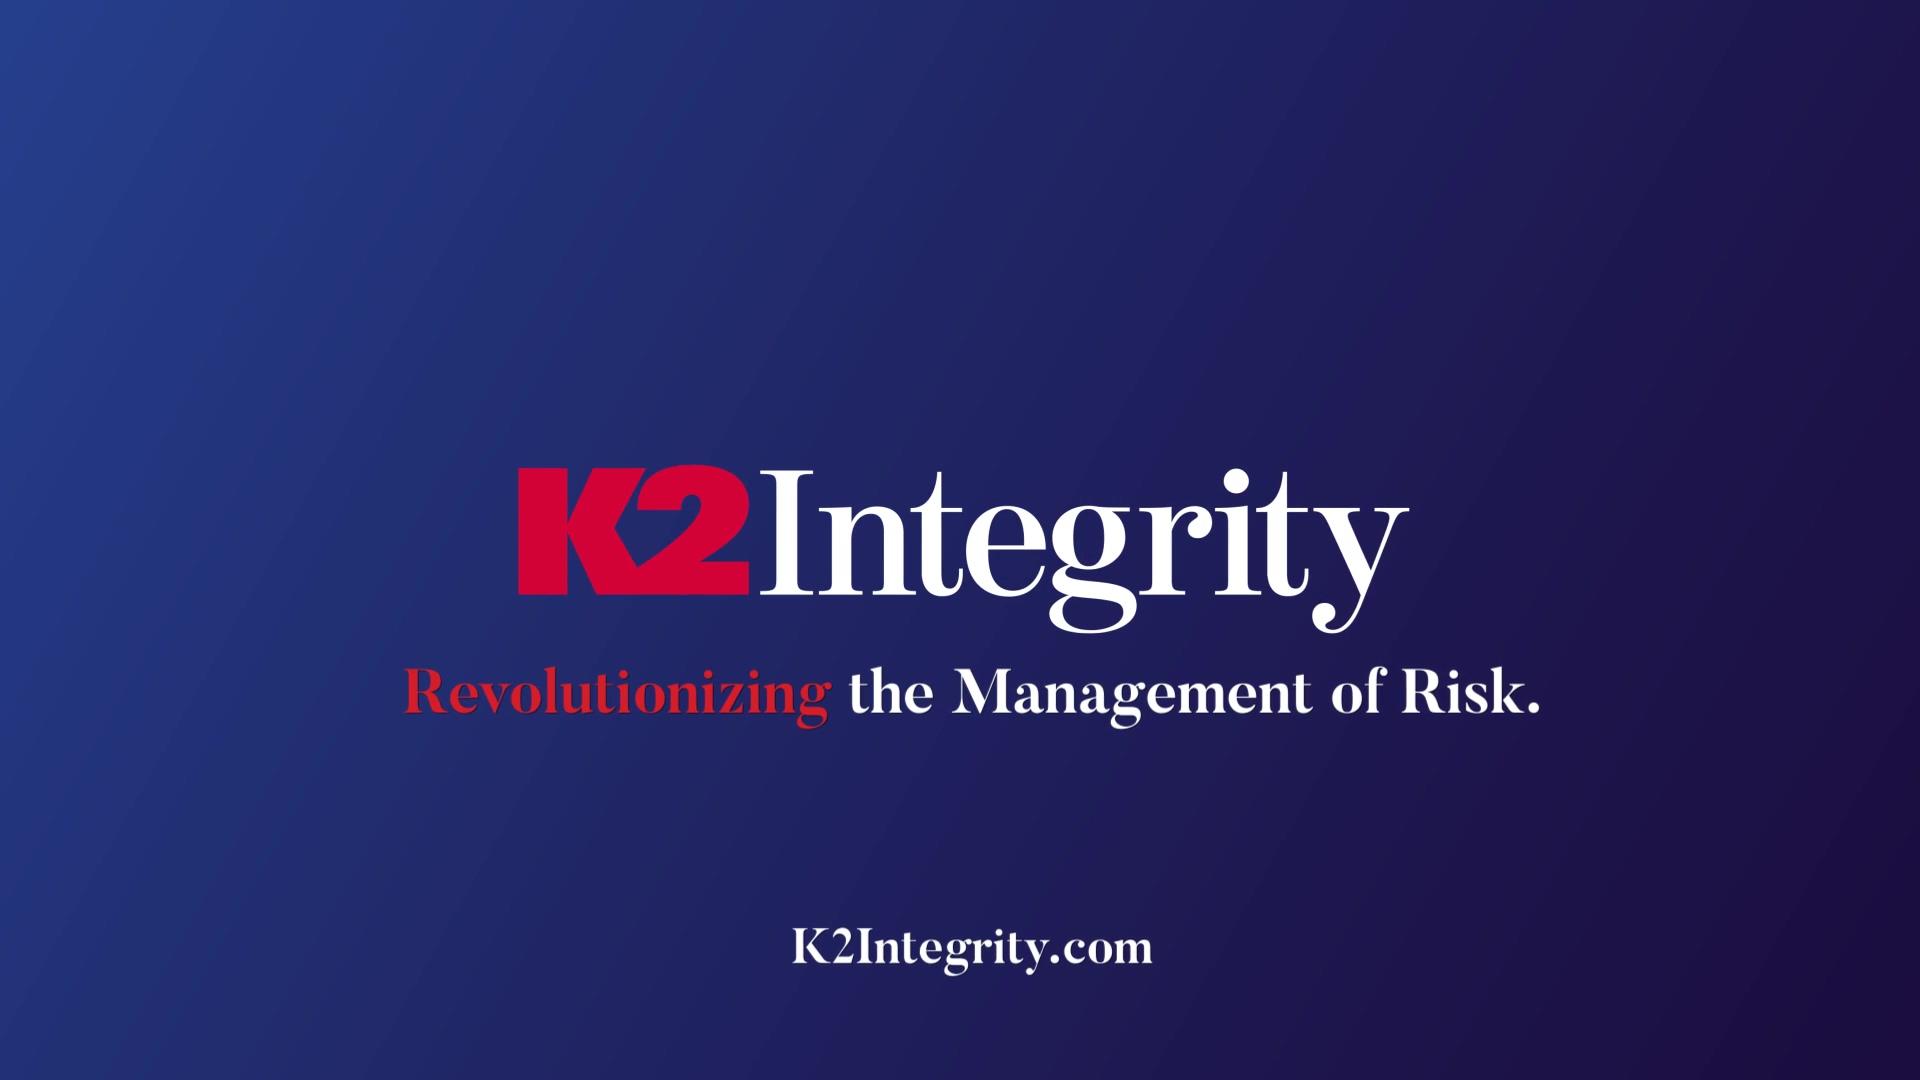 K2 Integrity_Brand Announcement Video